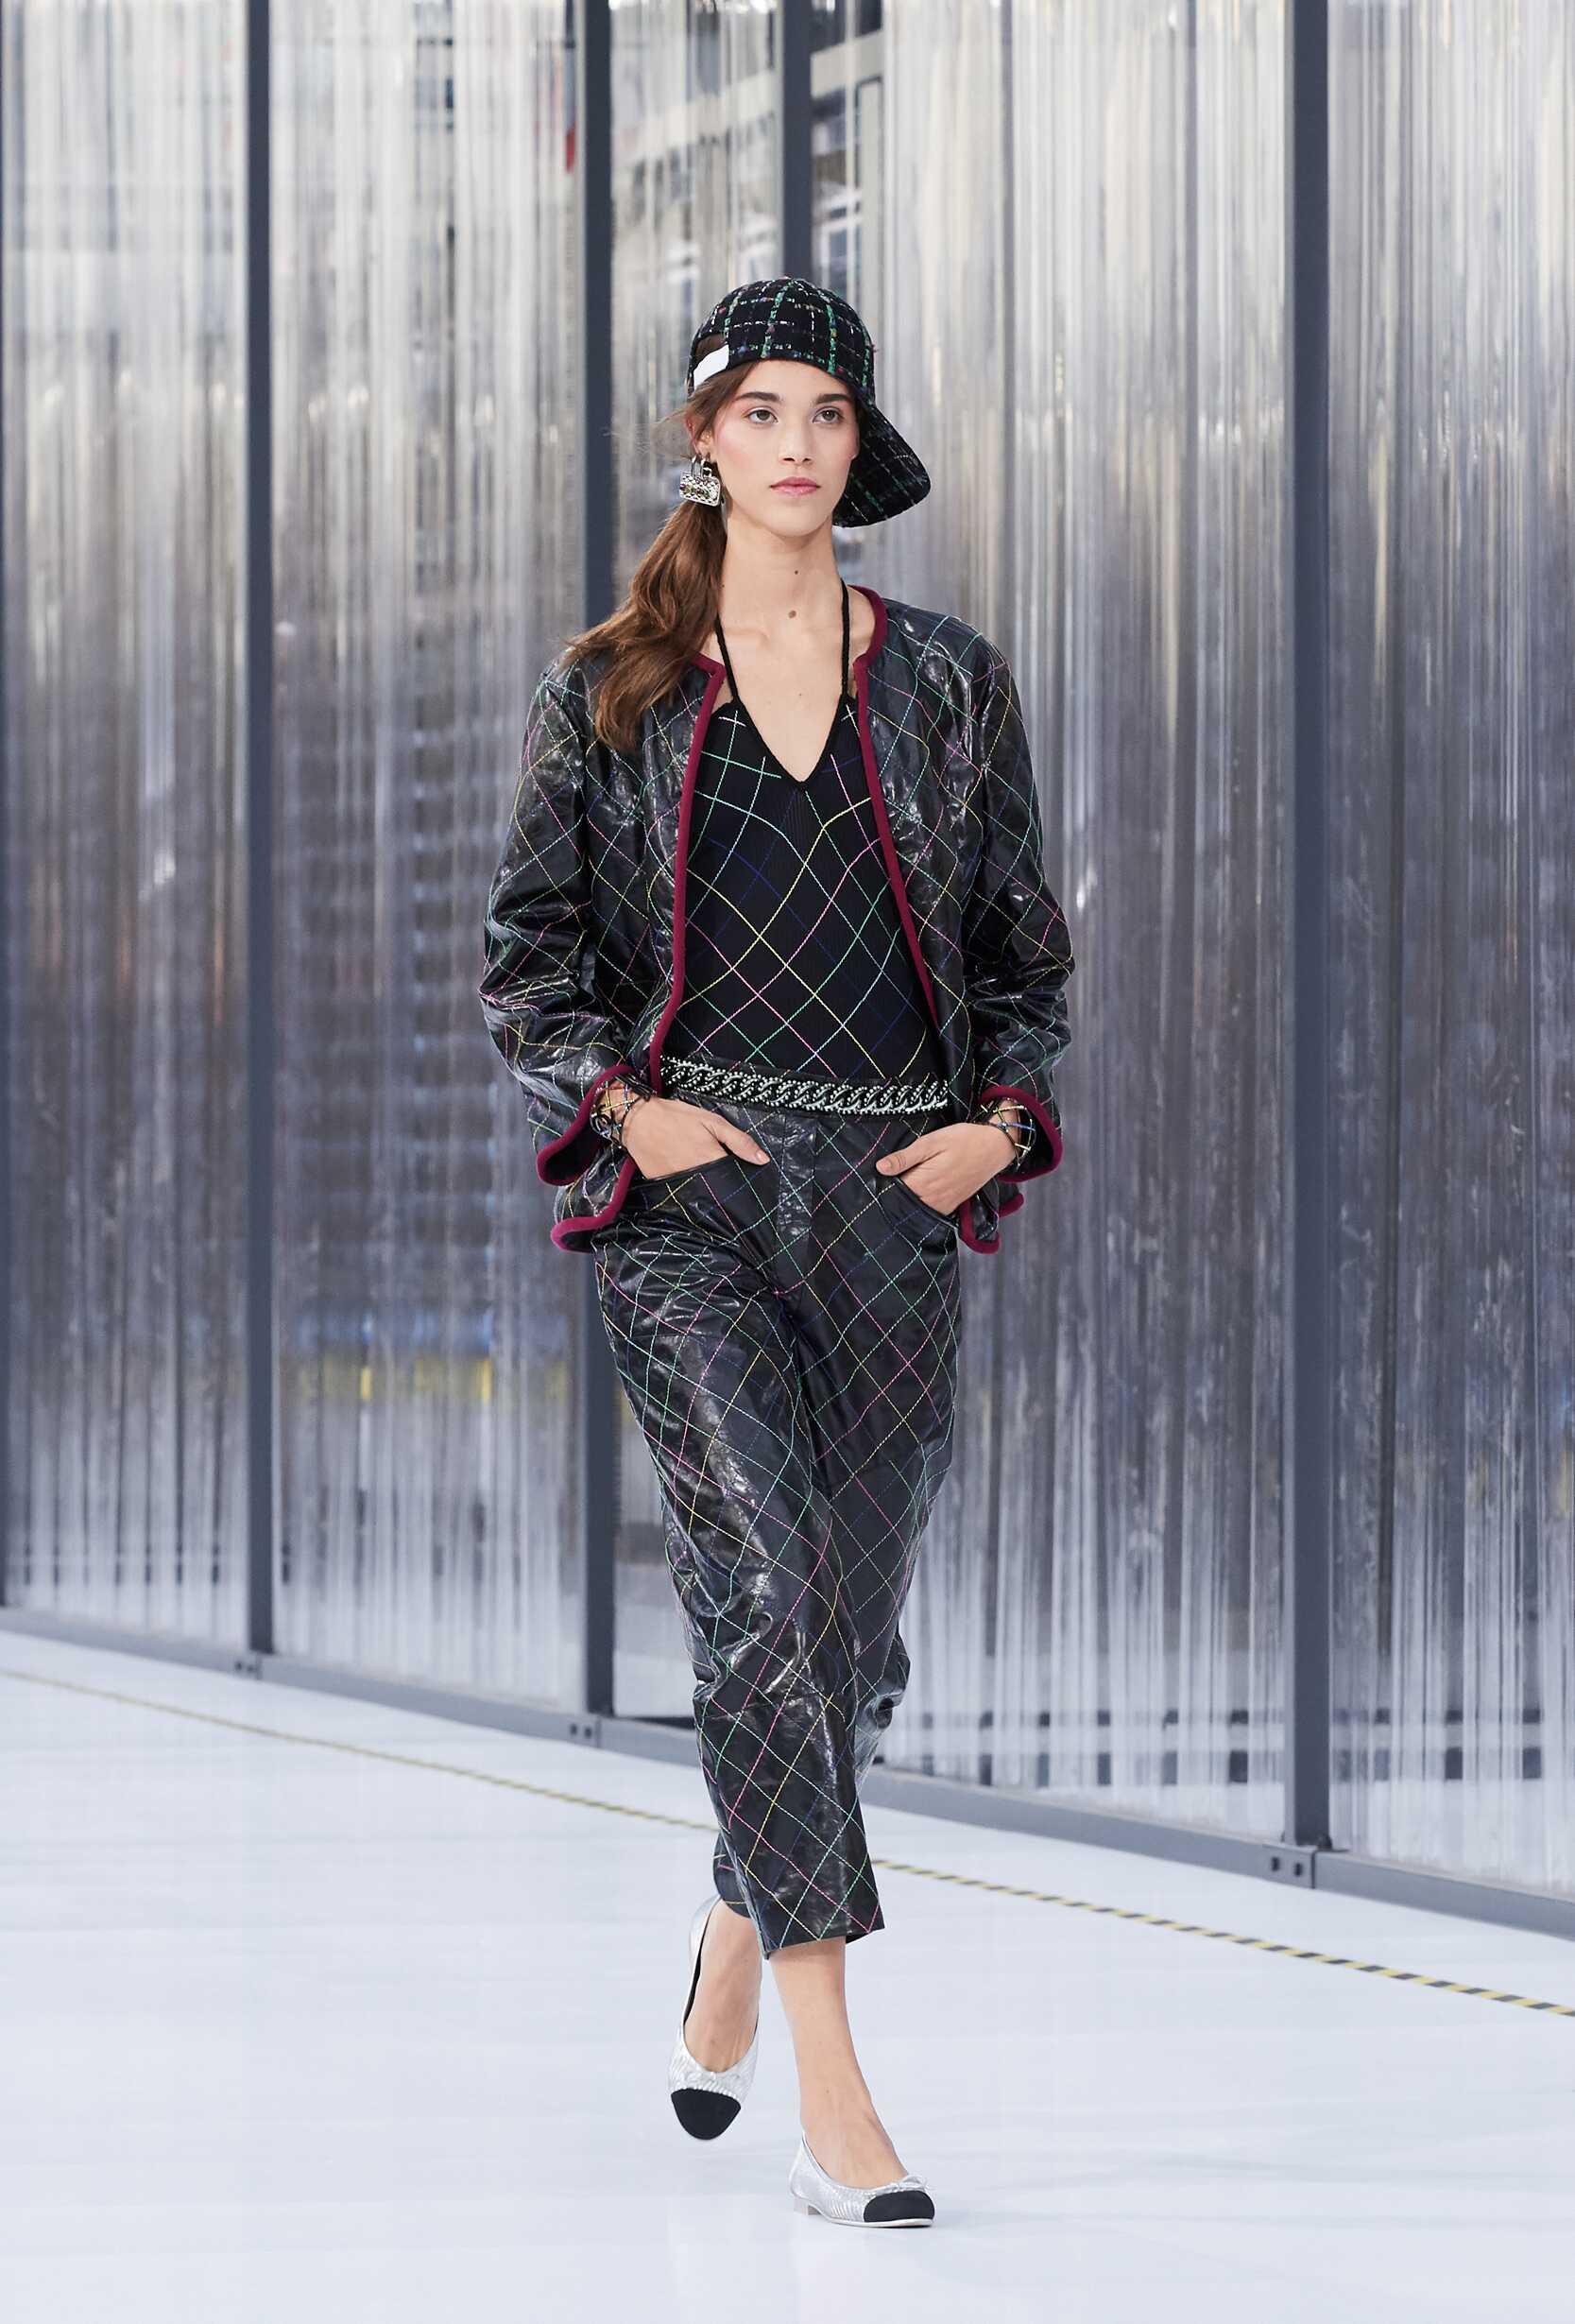 Chanel Summer 2017 Catwalk